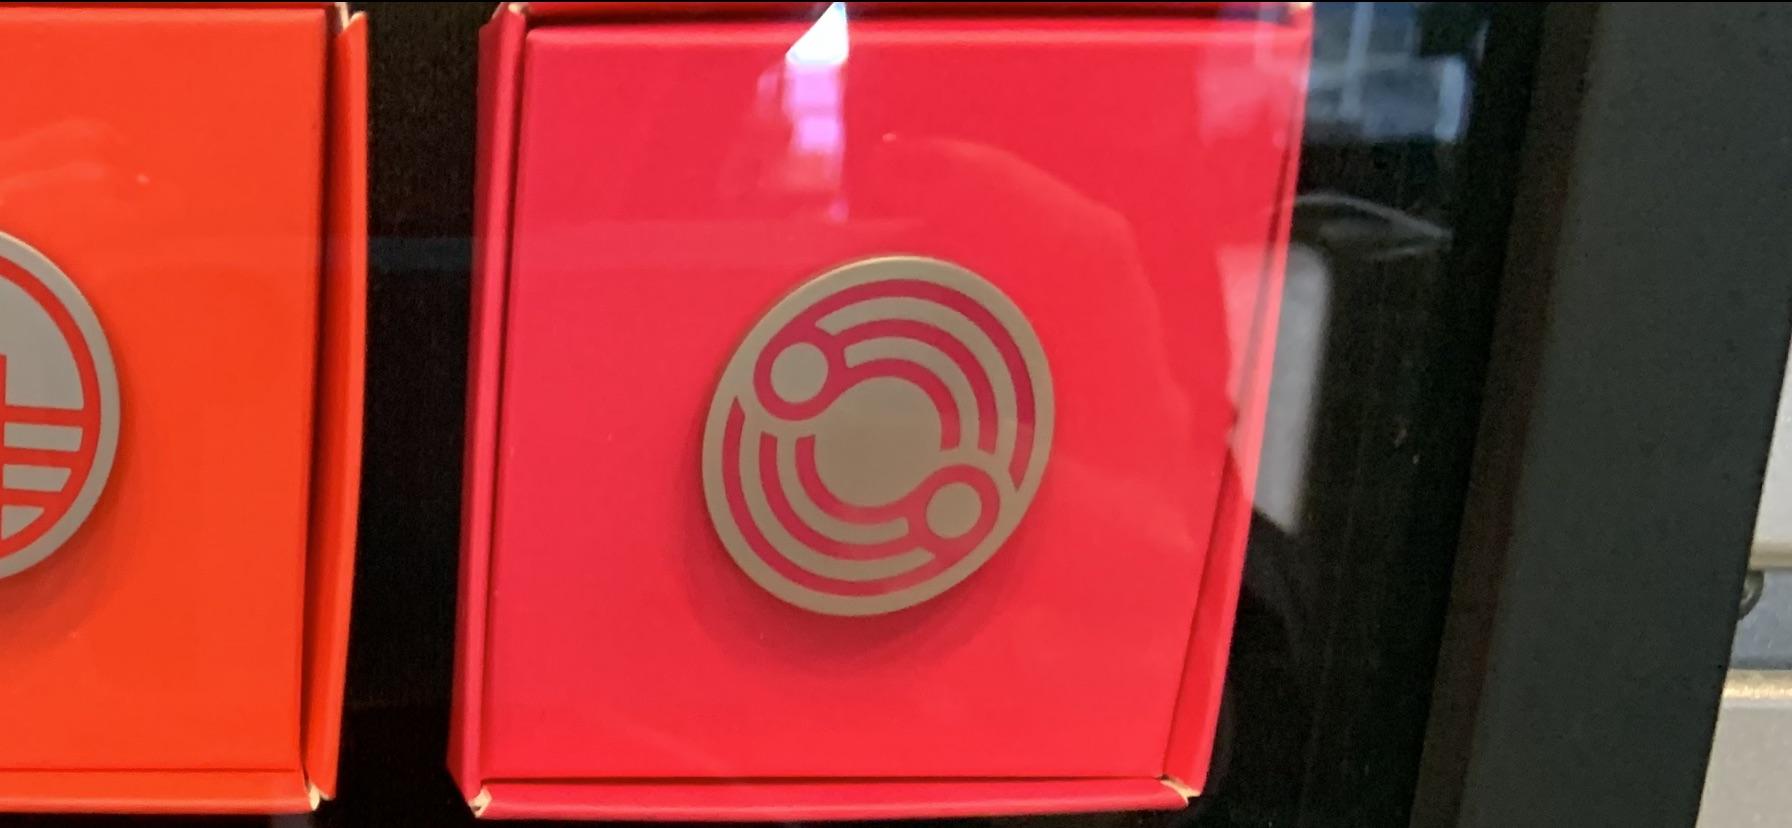 EPCOT pavilion logo pins 12/23/19 23